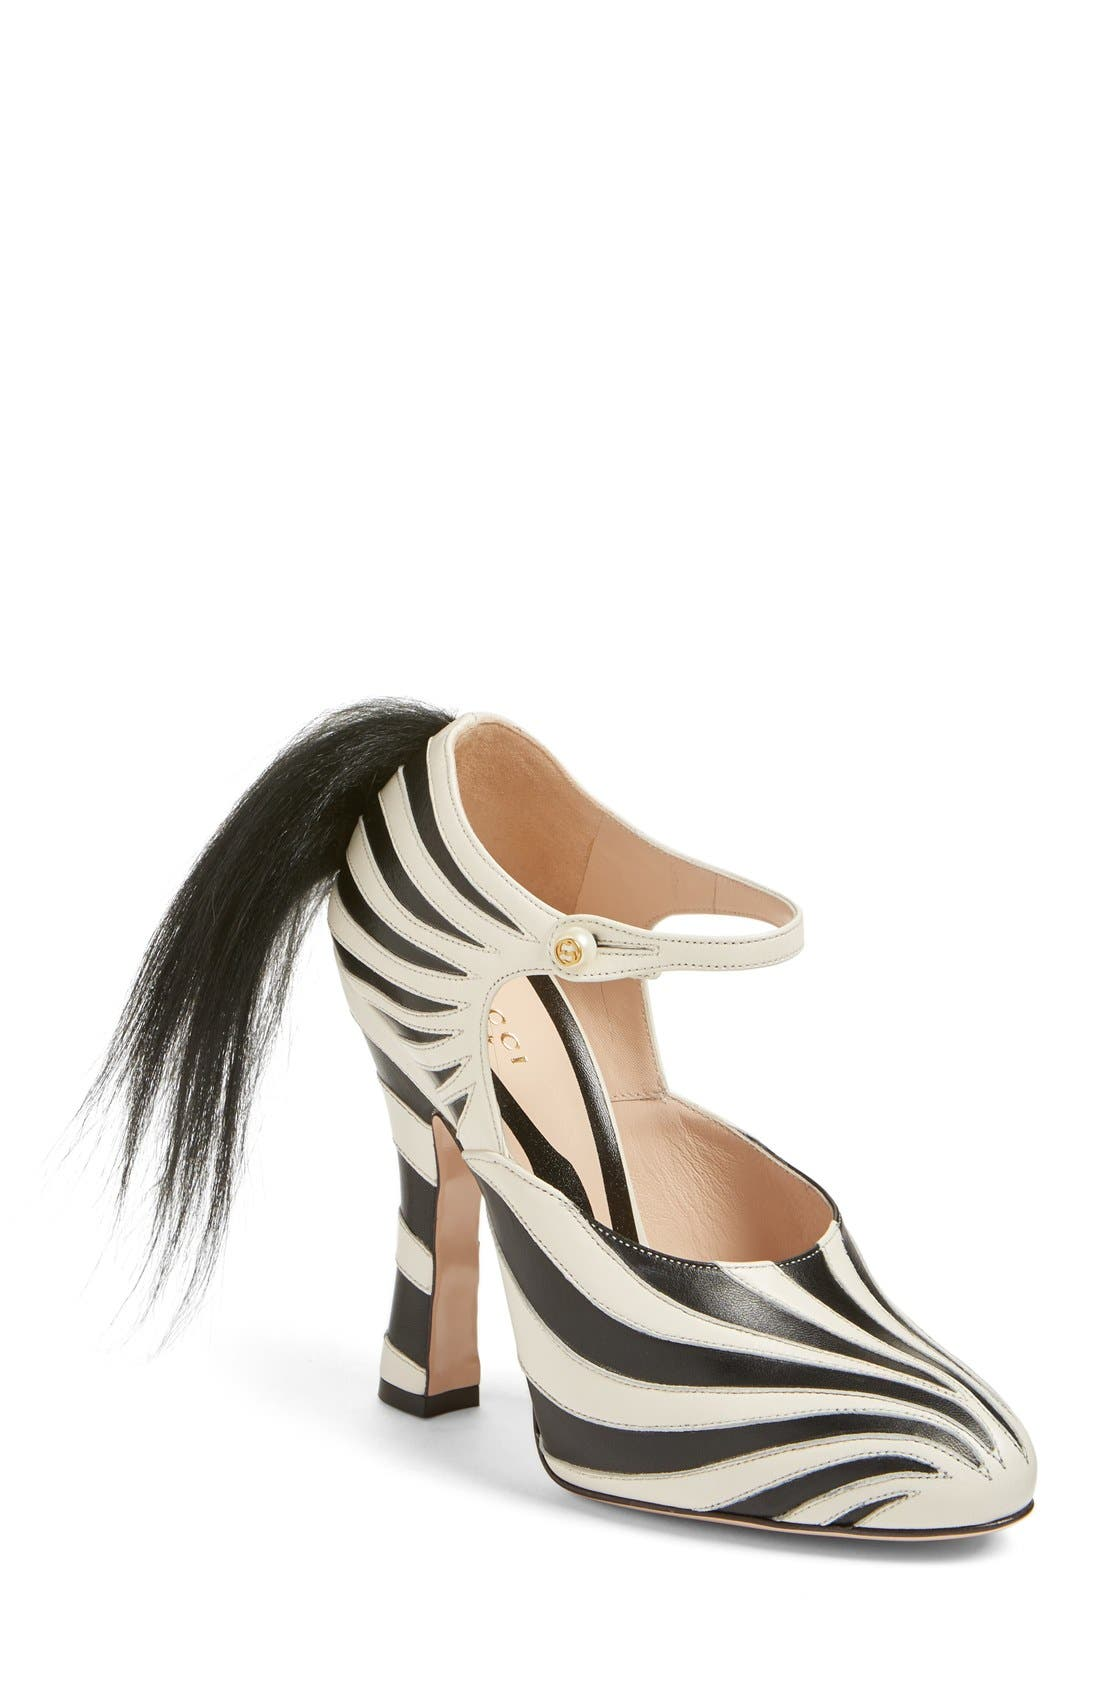 GUCCI 'Lesley' Zebra Stripe Pump, Main, color, 124